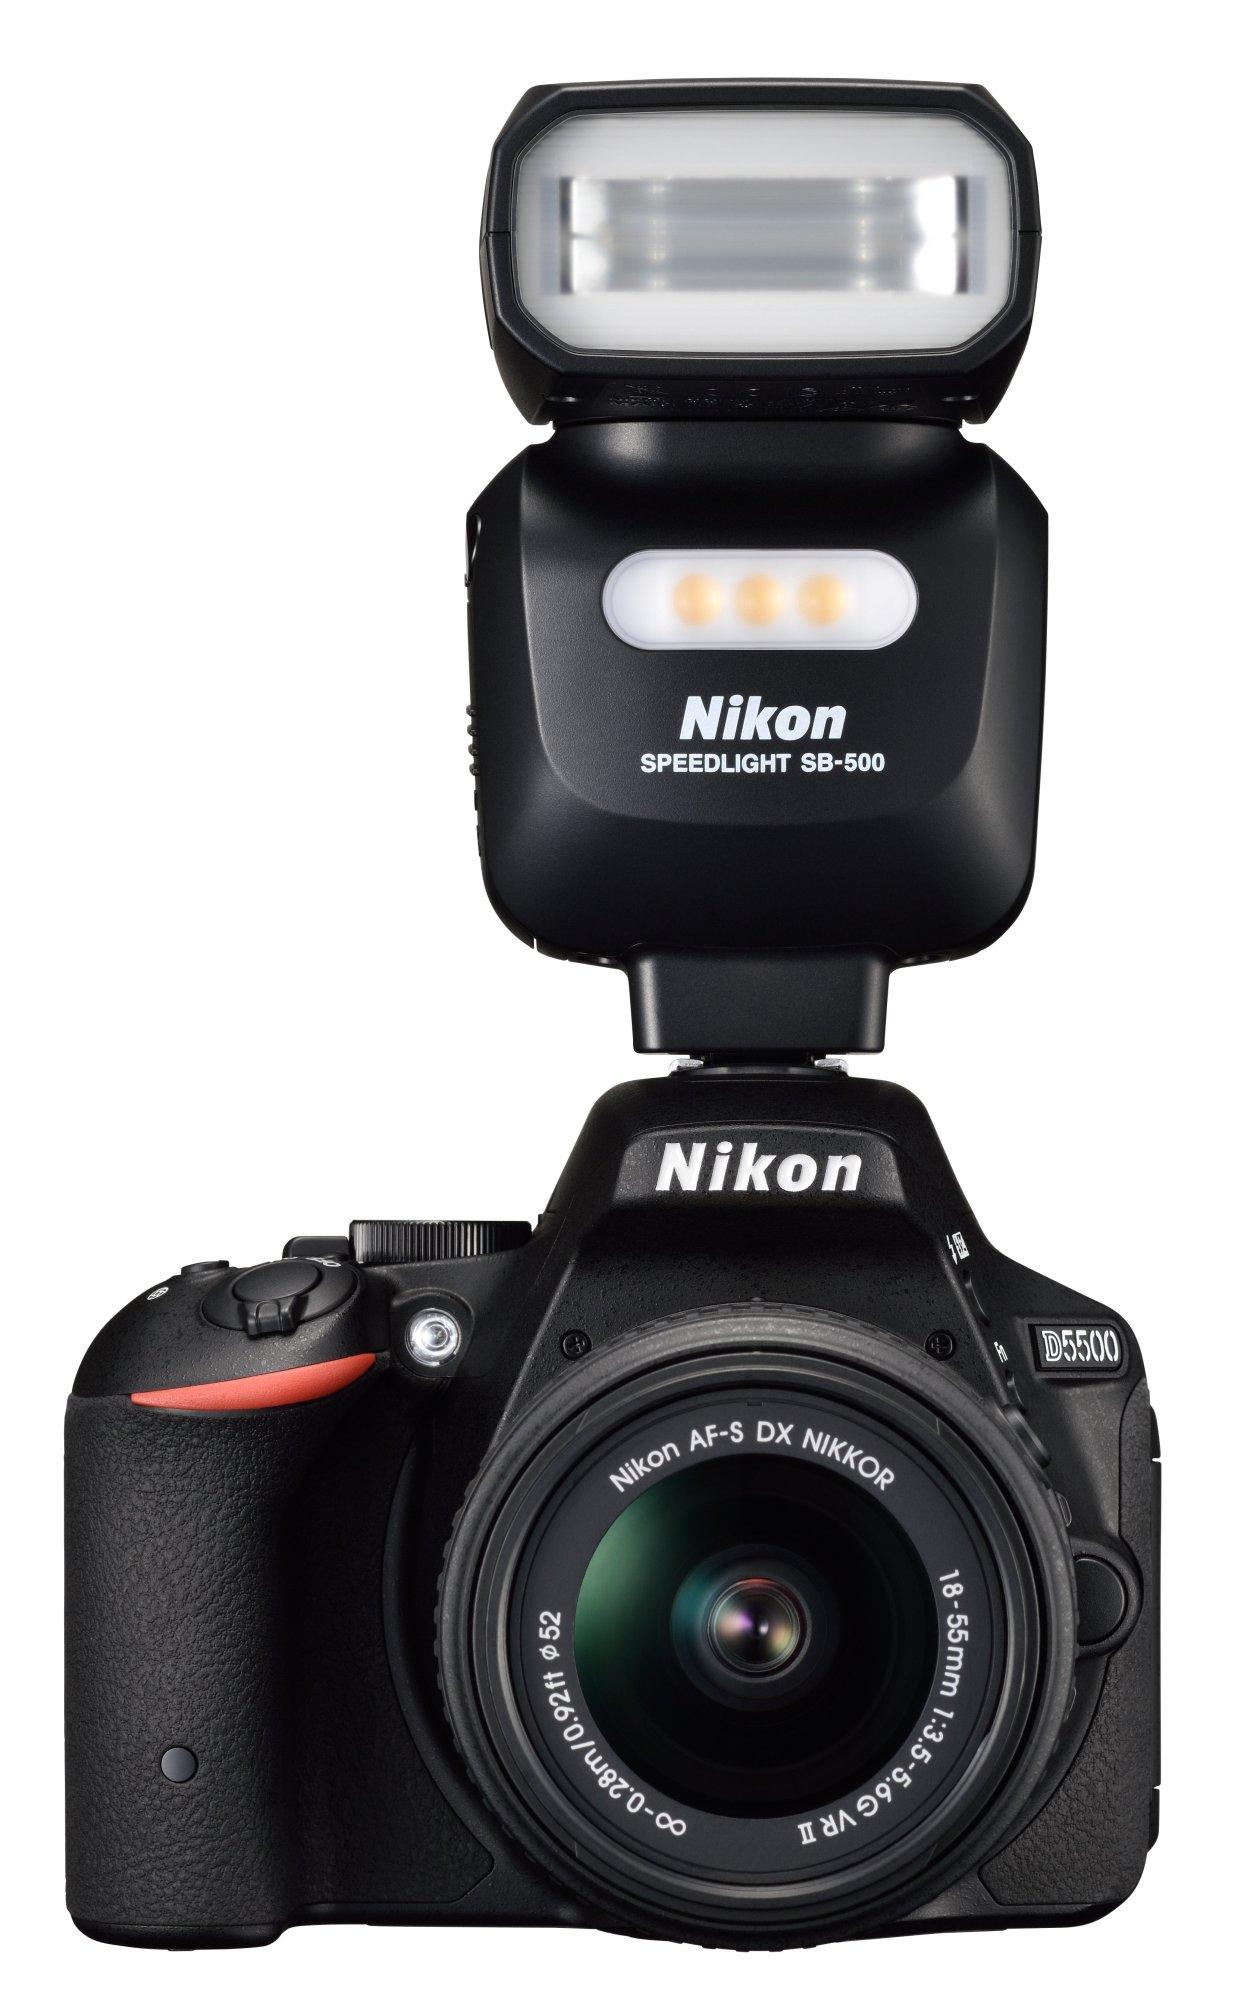 Test spiegelreflexkamera nikon d5500 c 39 t fotografie for 5500 3